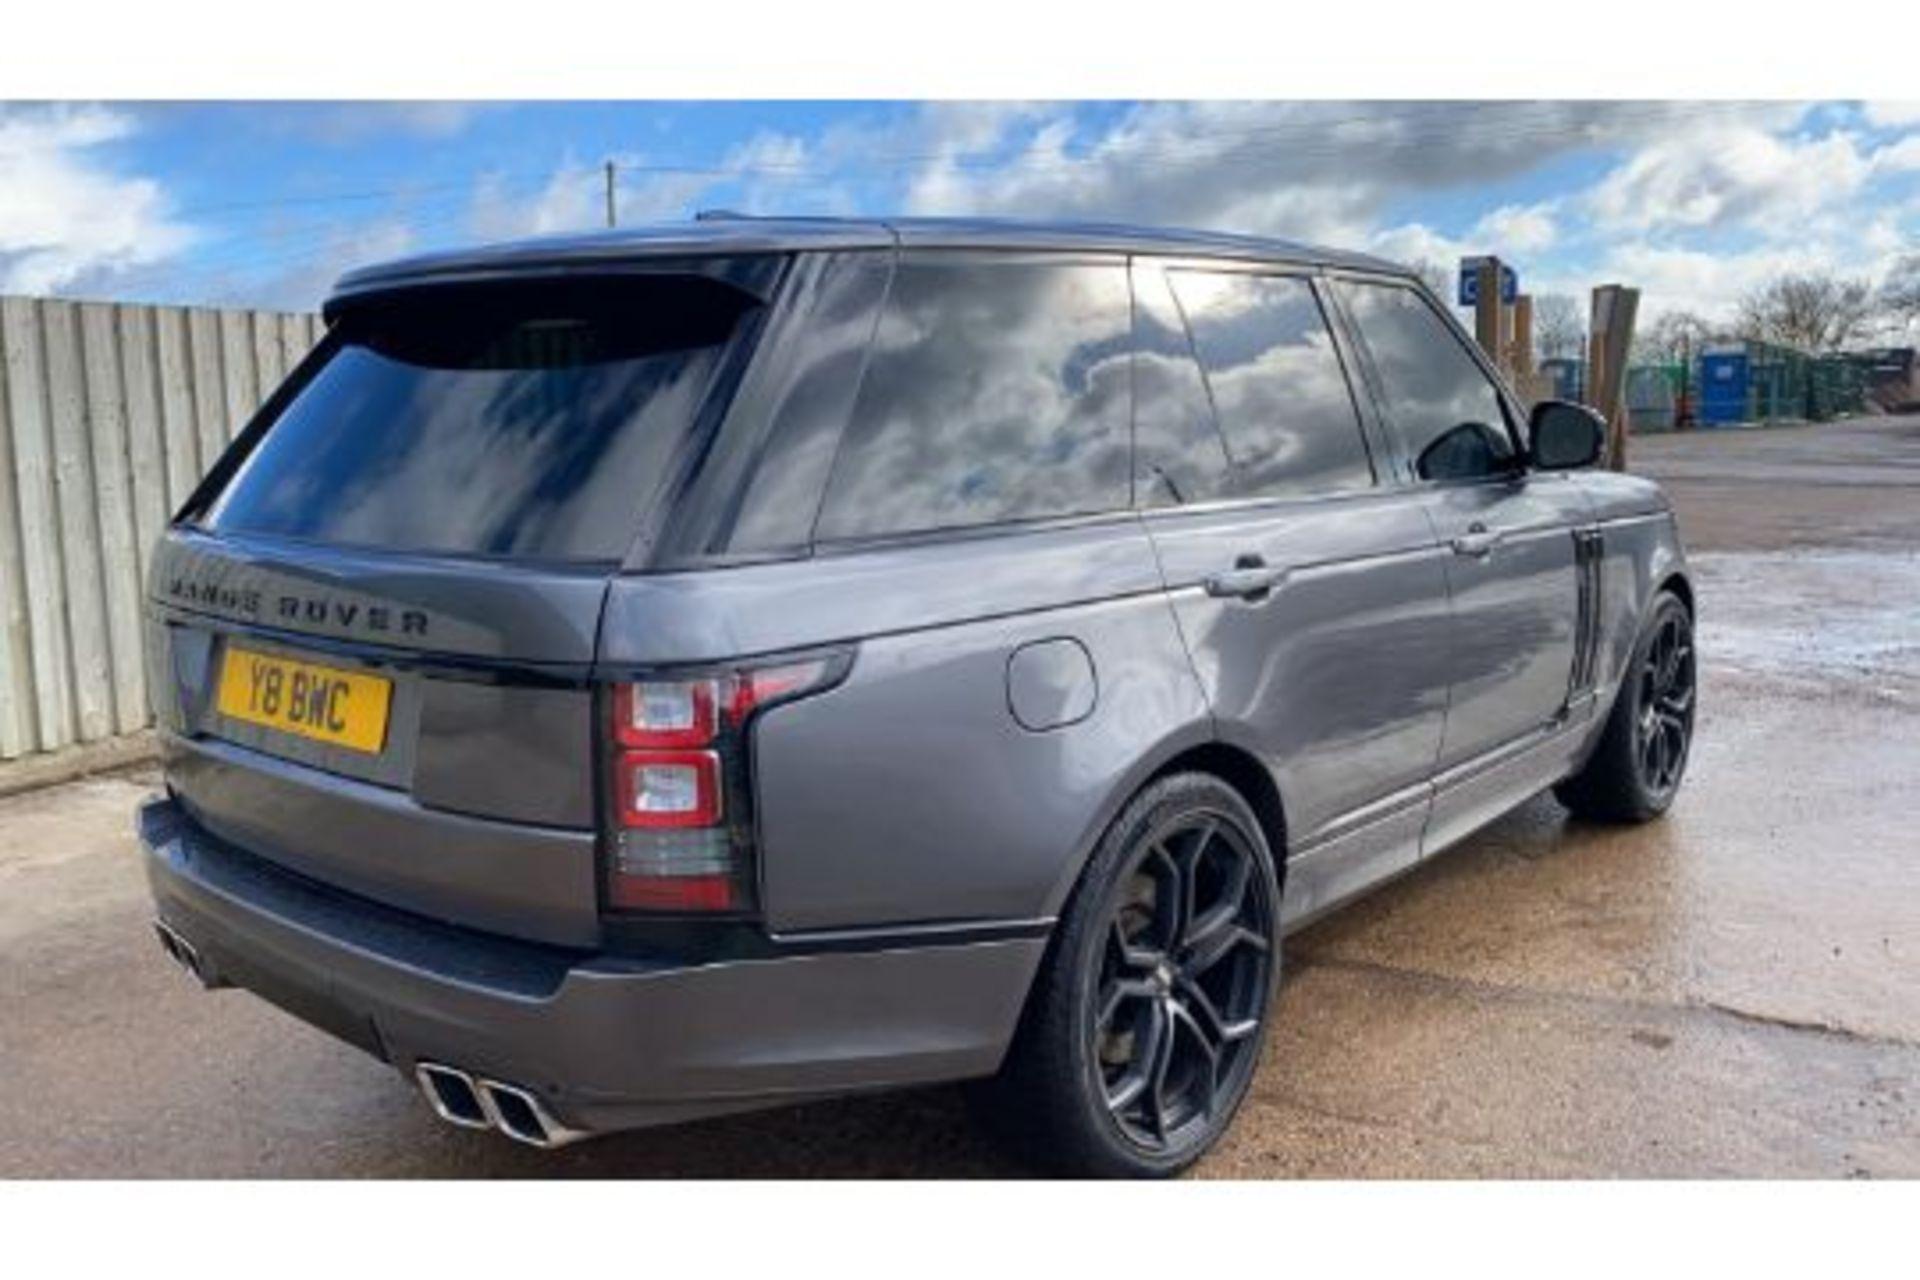 Range Rover Vogue 3.0 TDV6 SE Auto - Black Pack - NEW SHAPE - FULLY LOADED - Pan Roof - Image 7 of 30